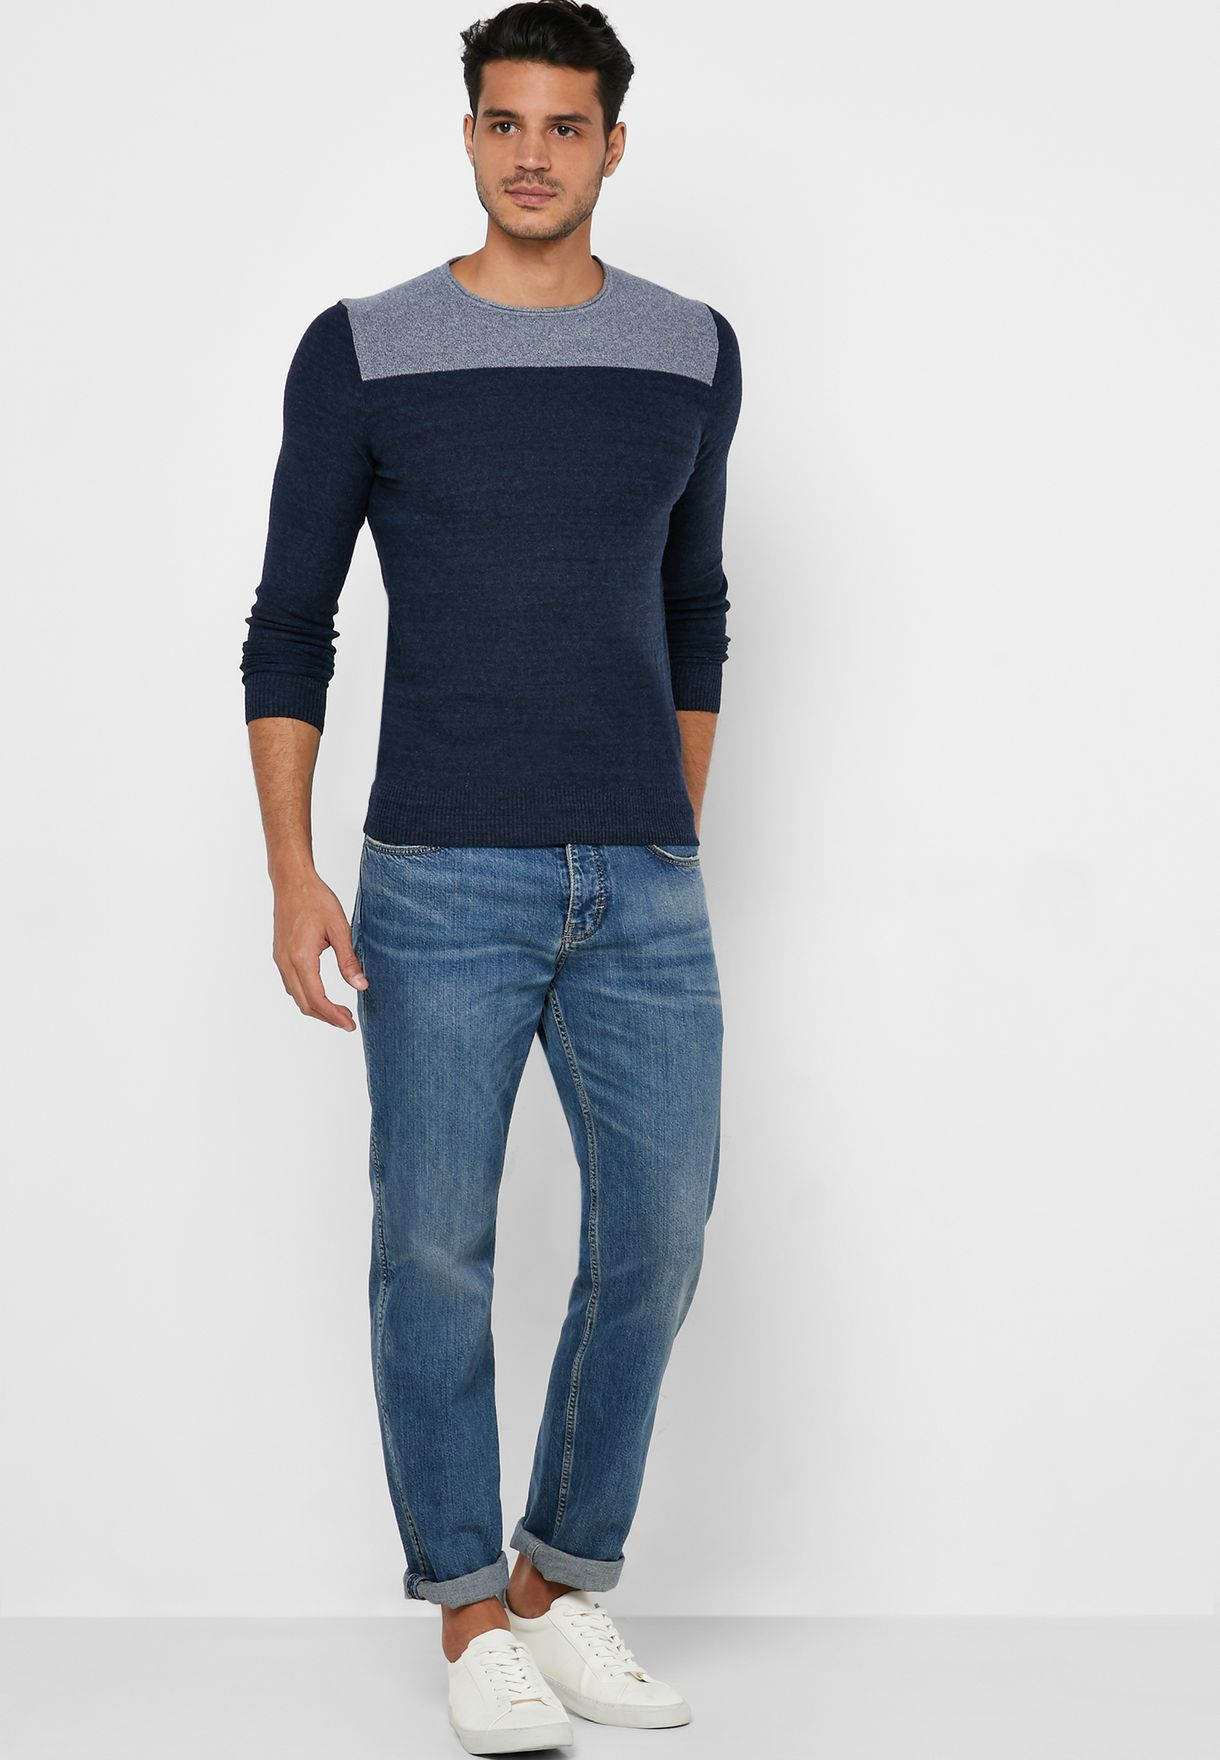 Textured Color Block Sweater